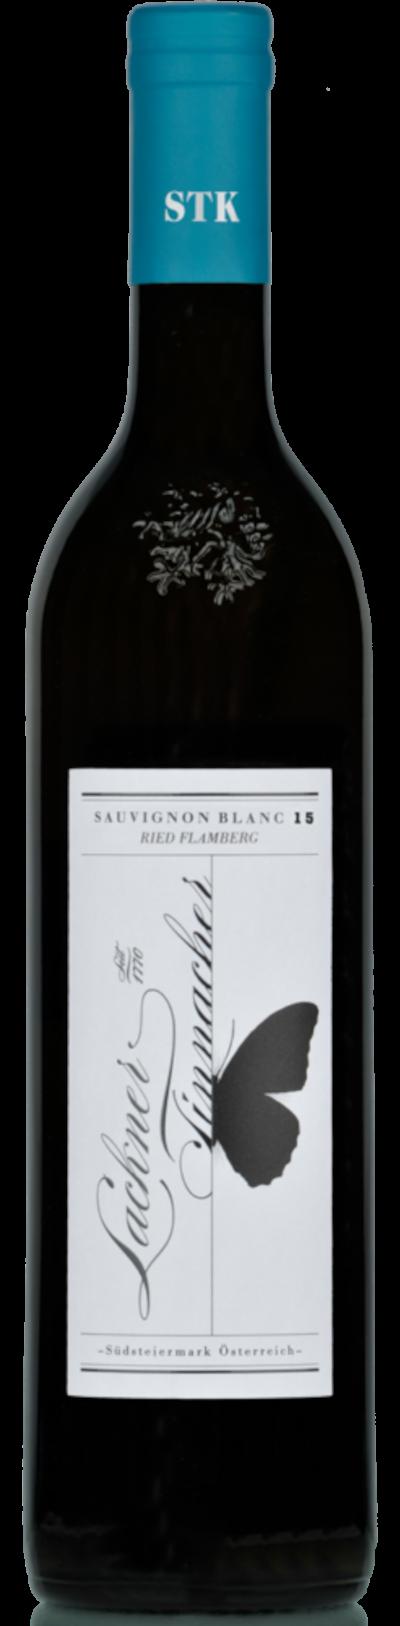 LacknerTinnacher - Sauvignon Blanc Ried Flamberg bio